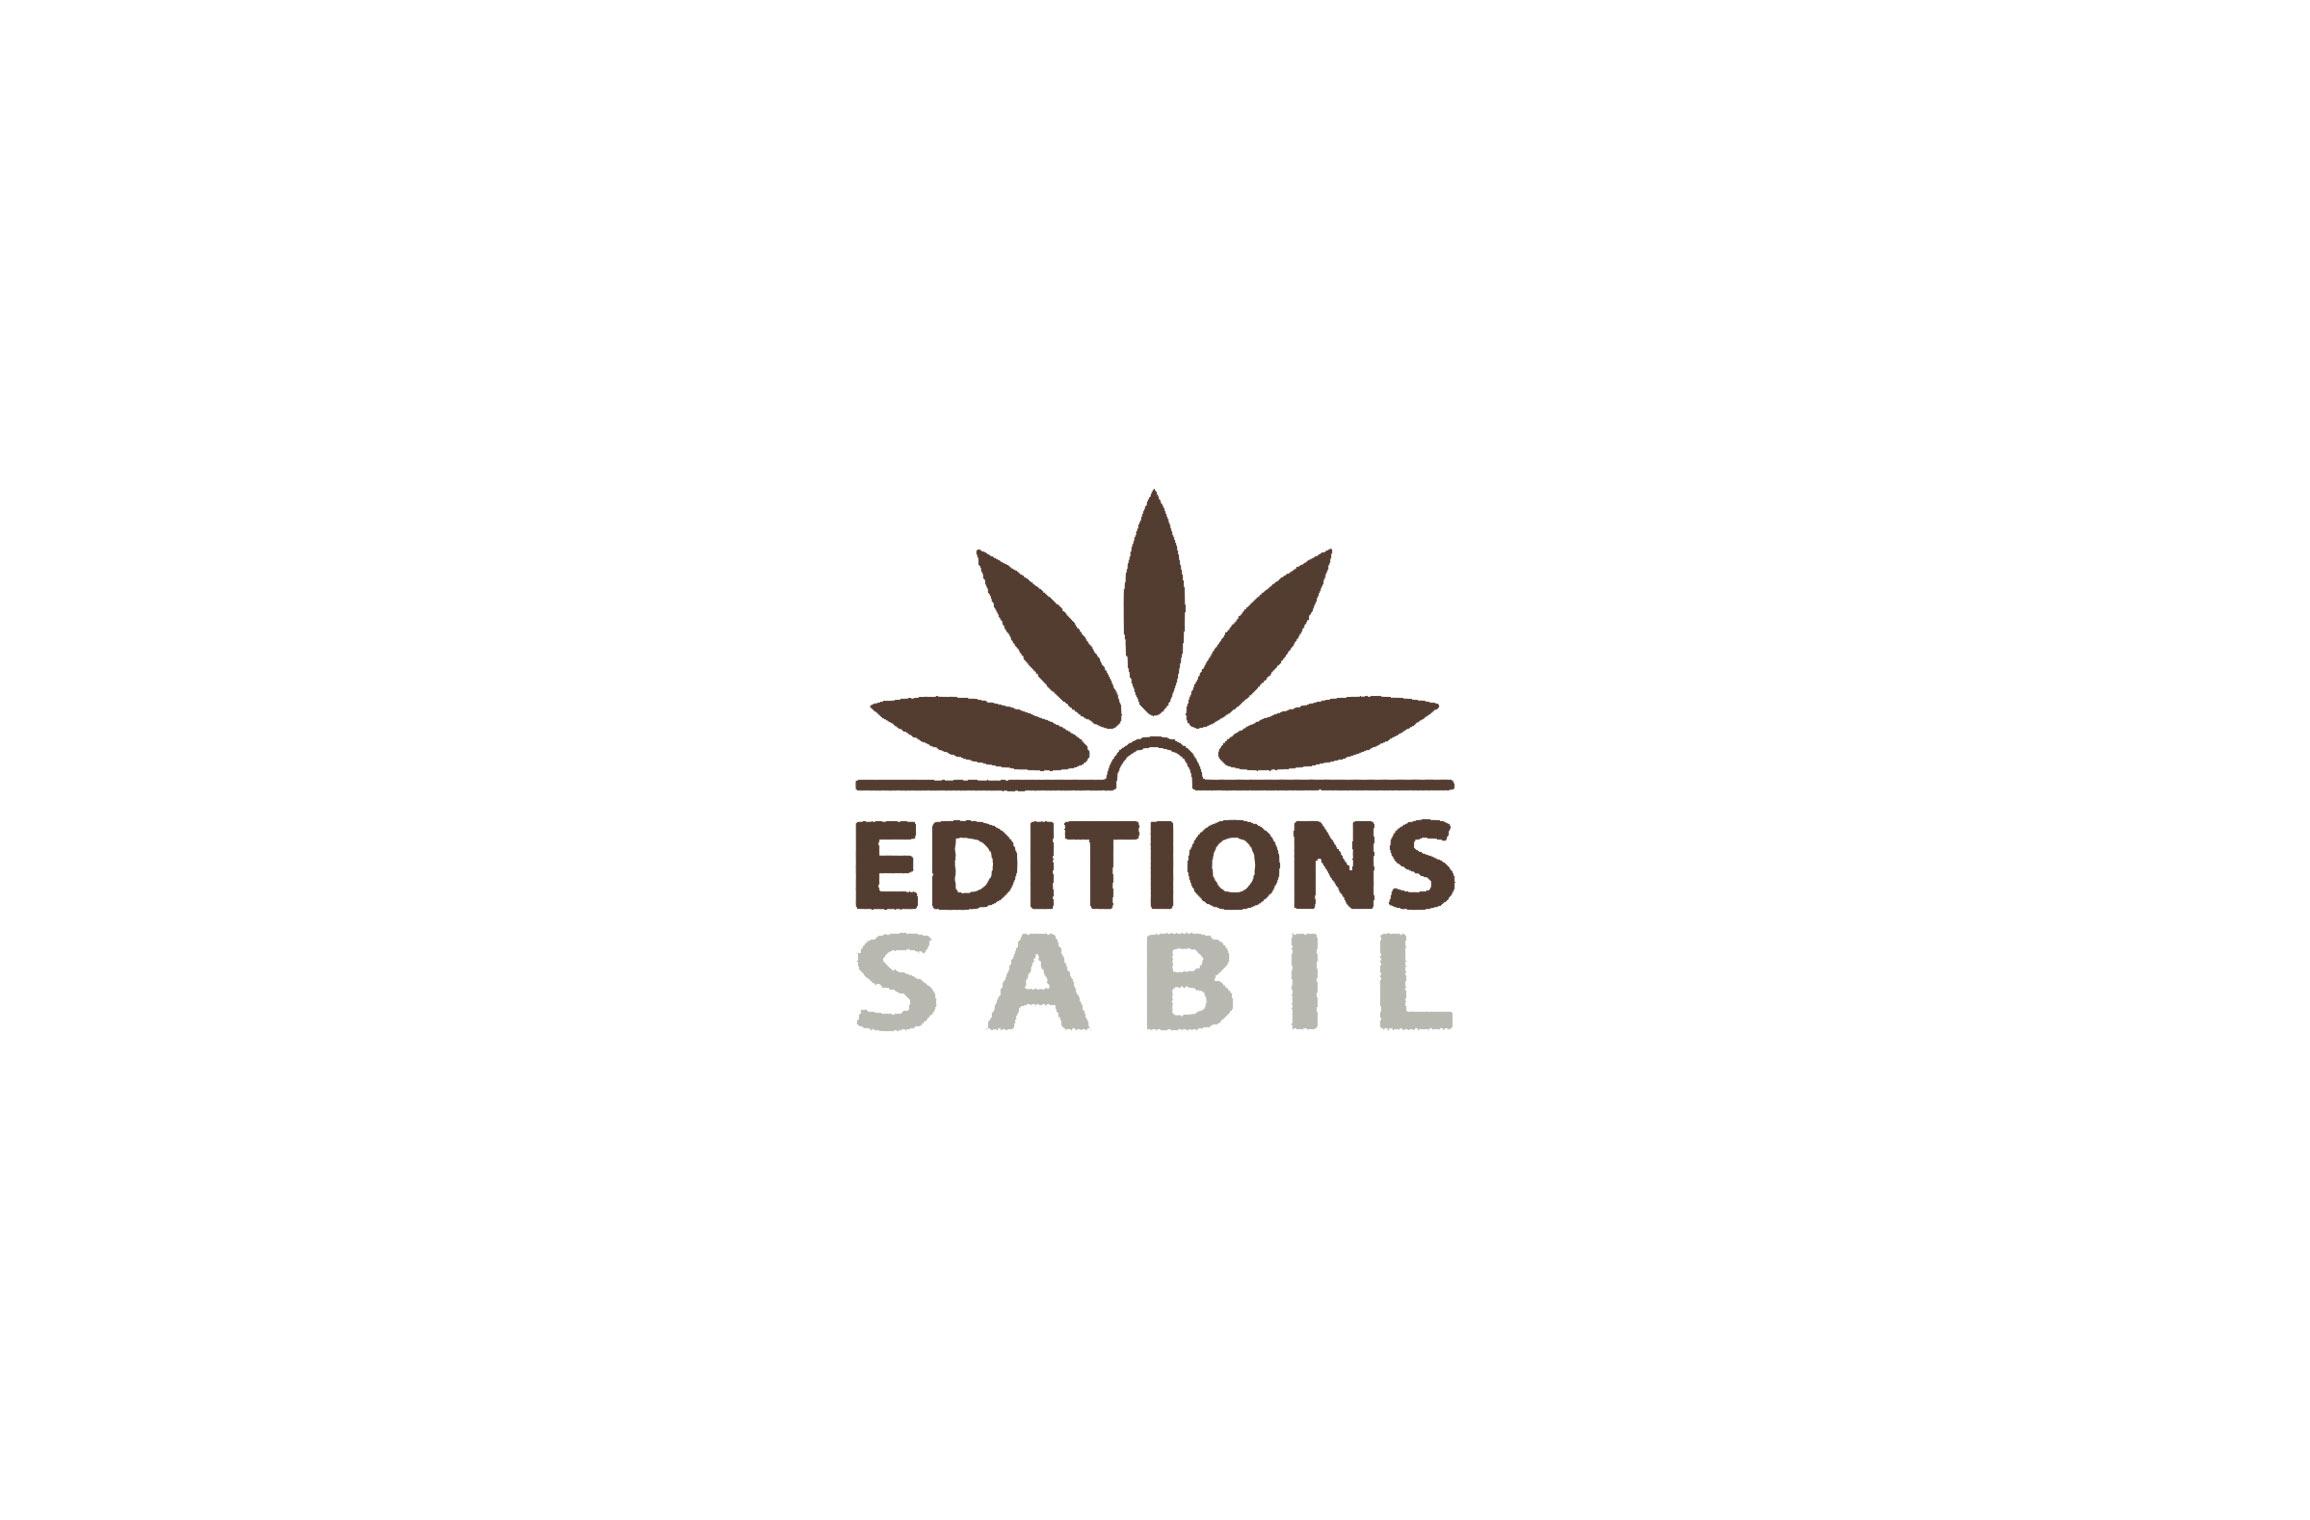 Edition Sabil